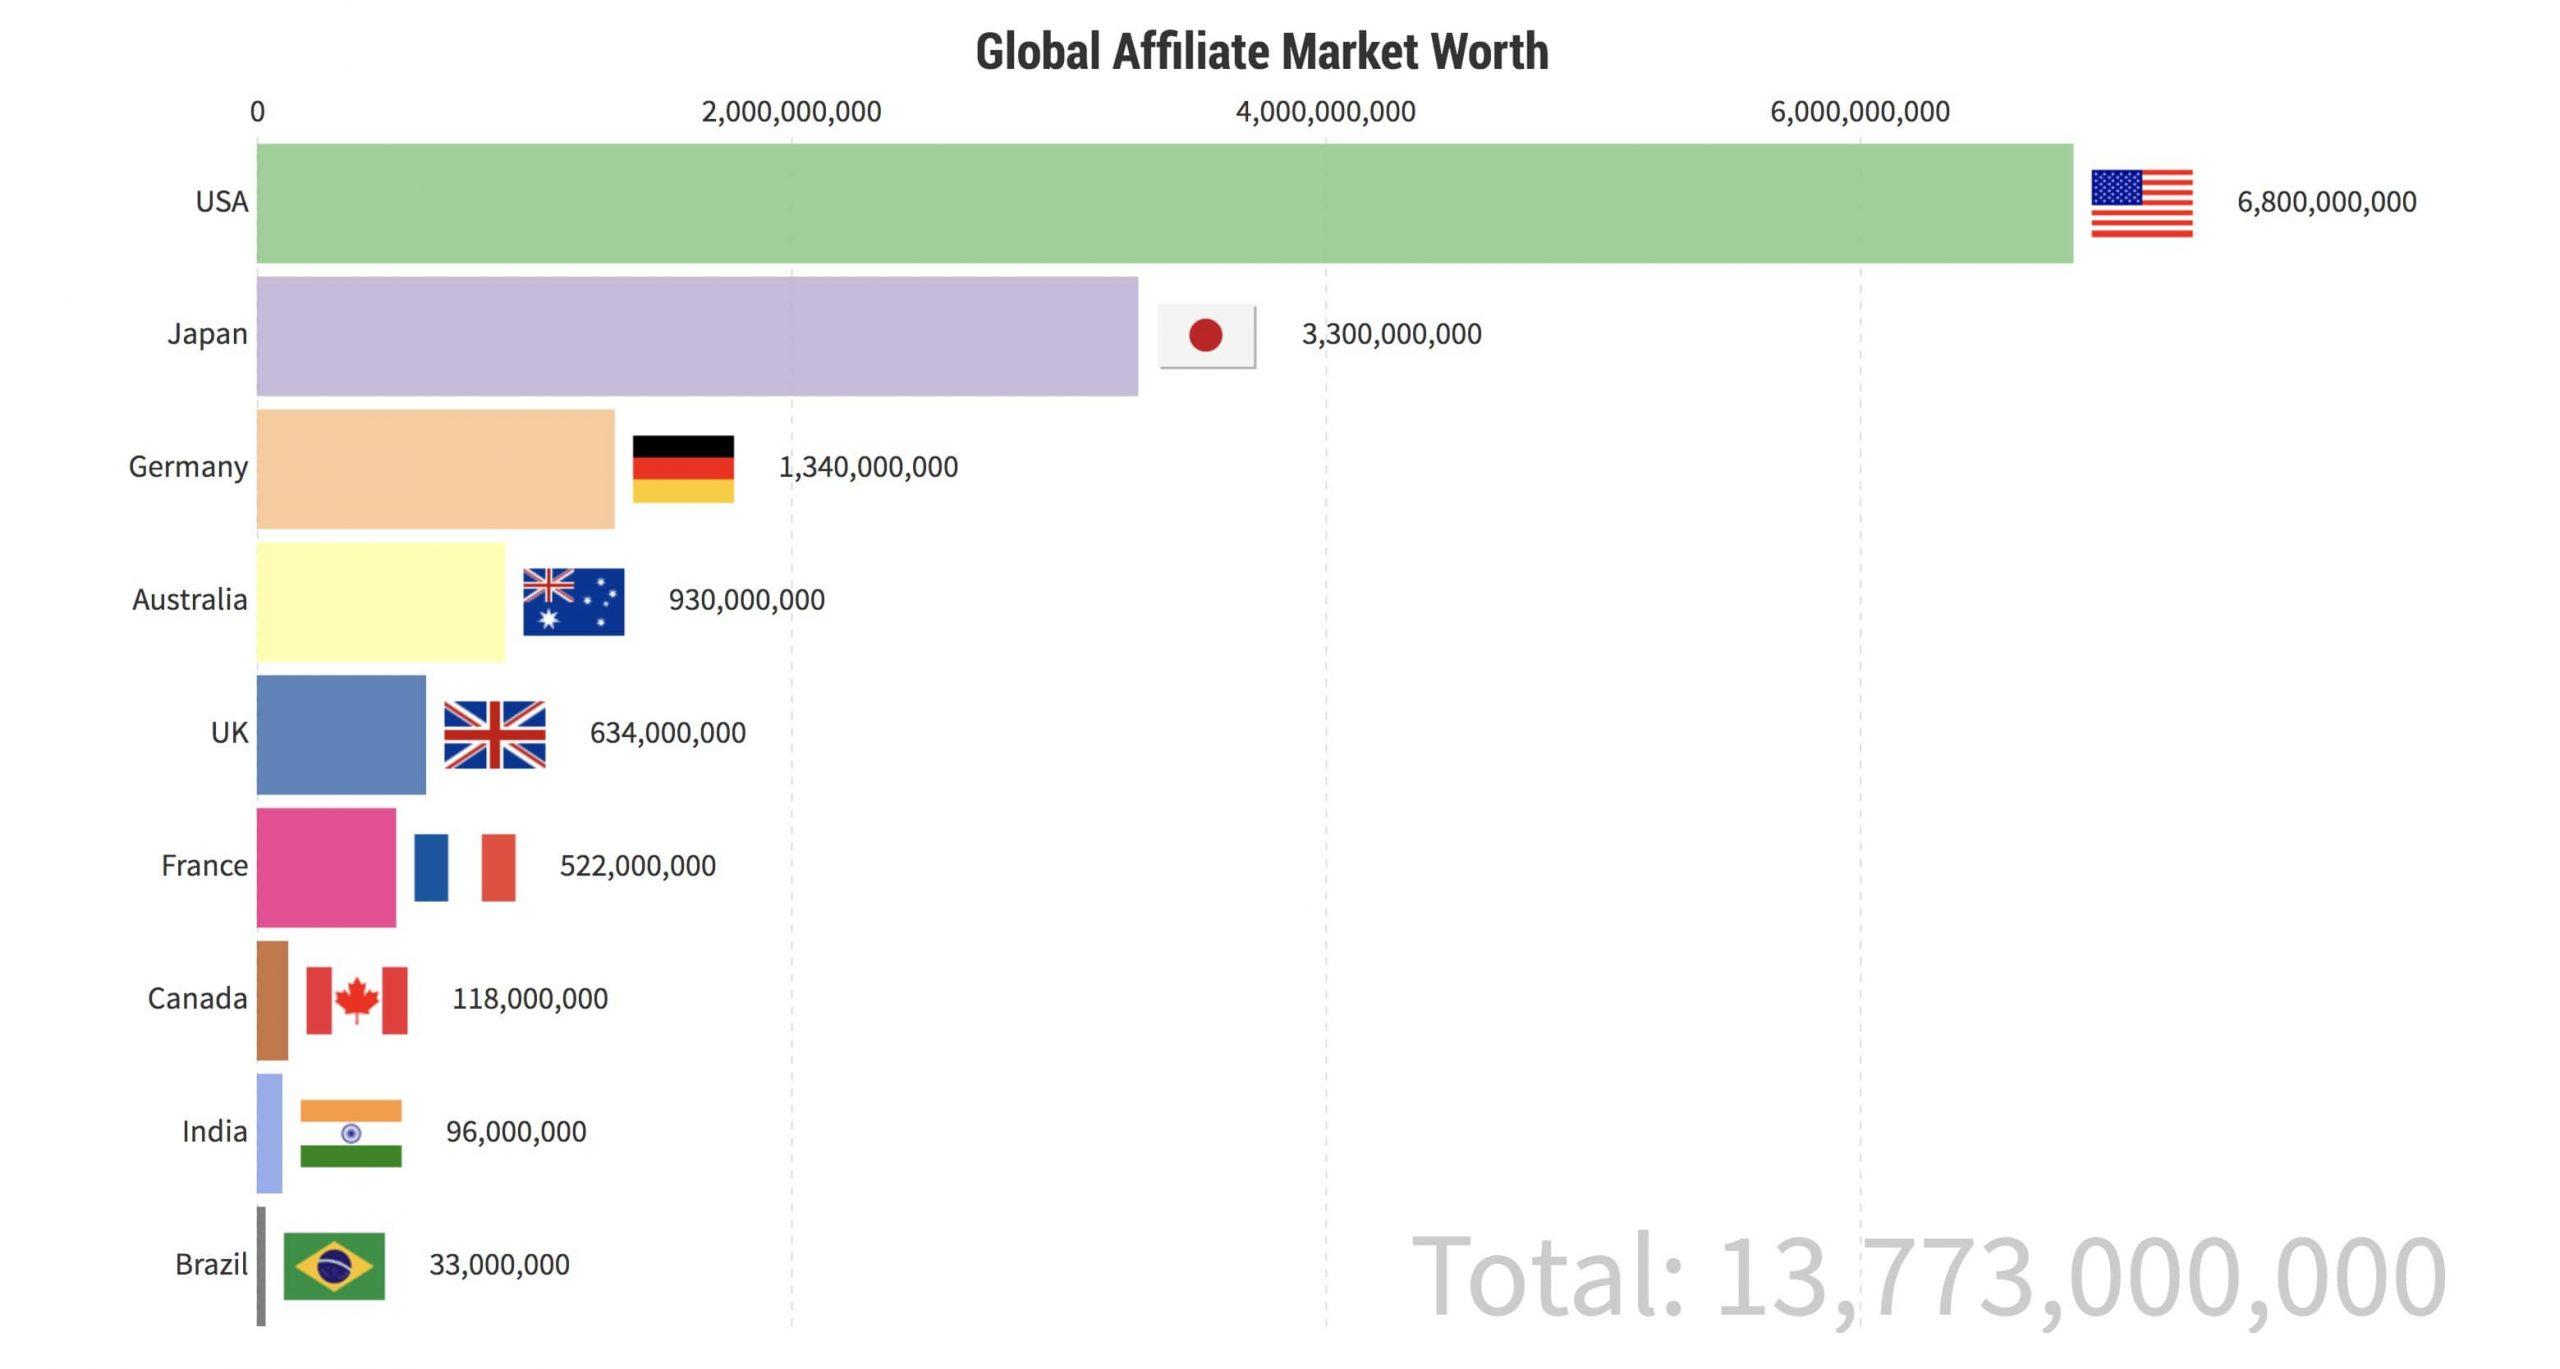 Global Affiliate Market Worth